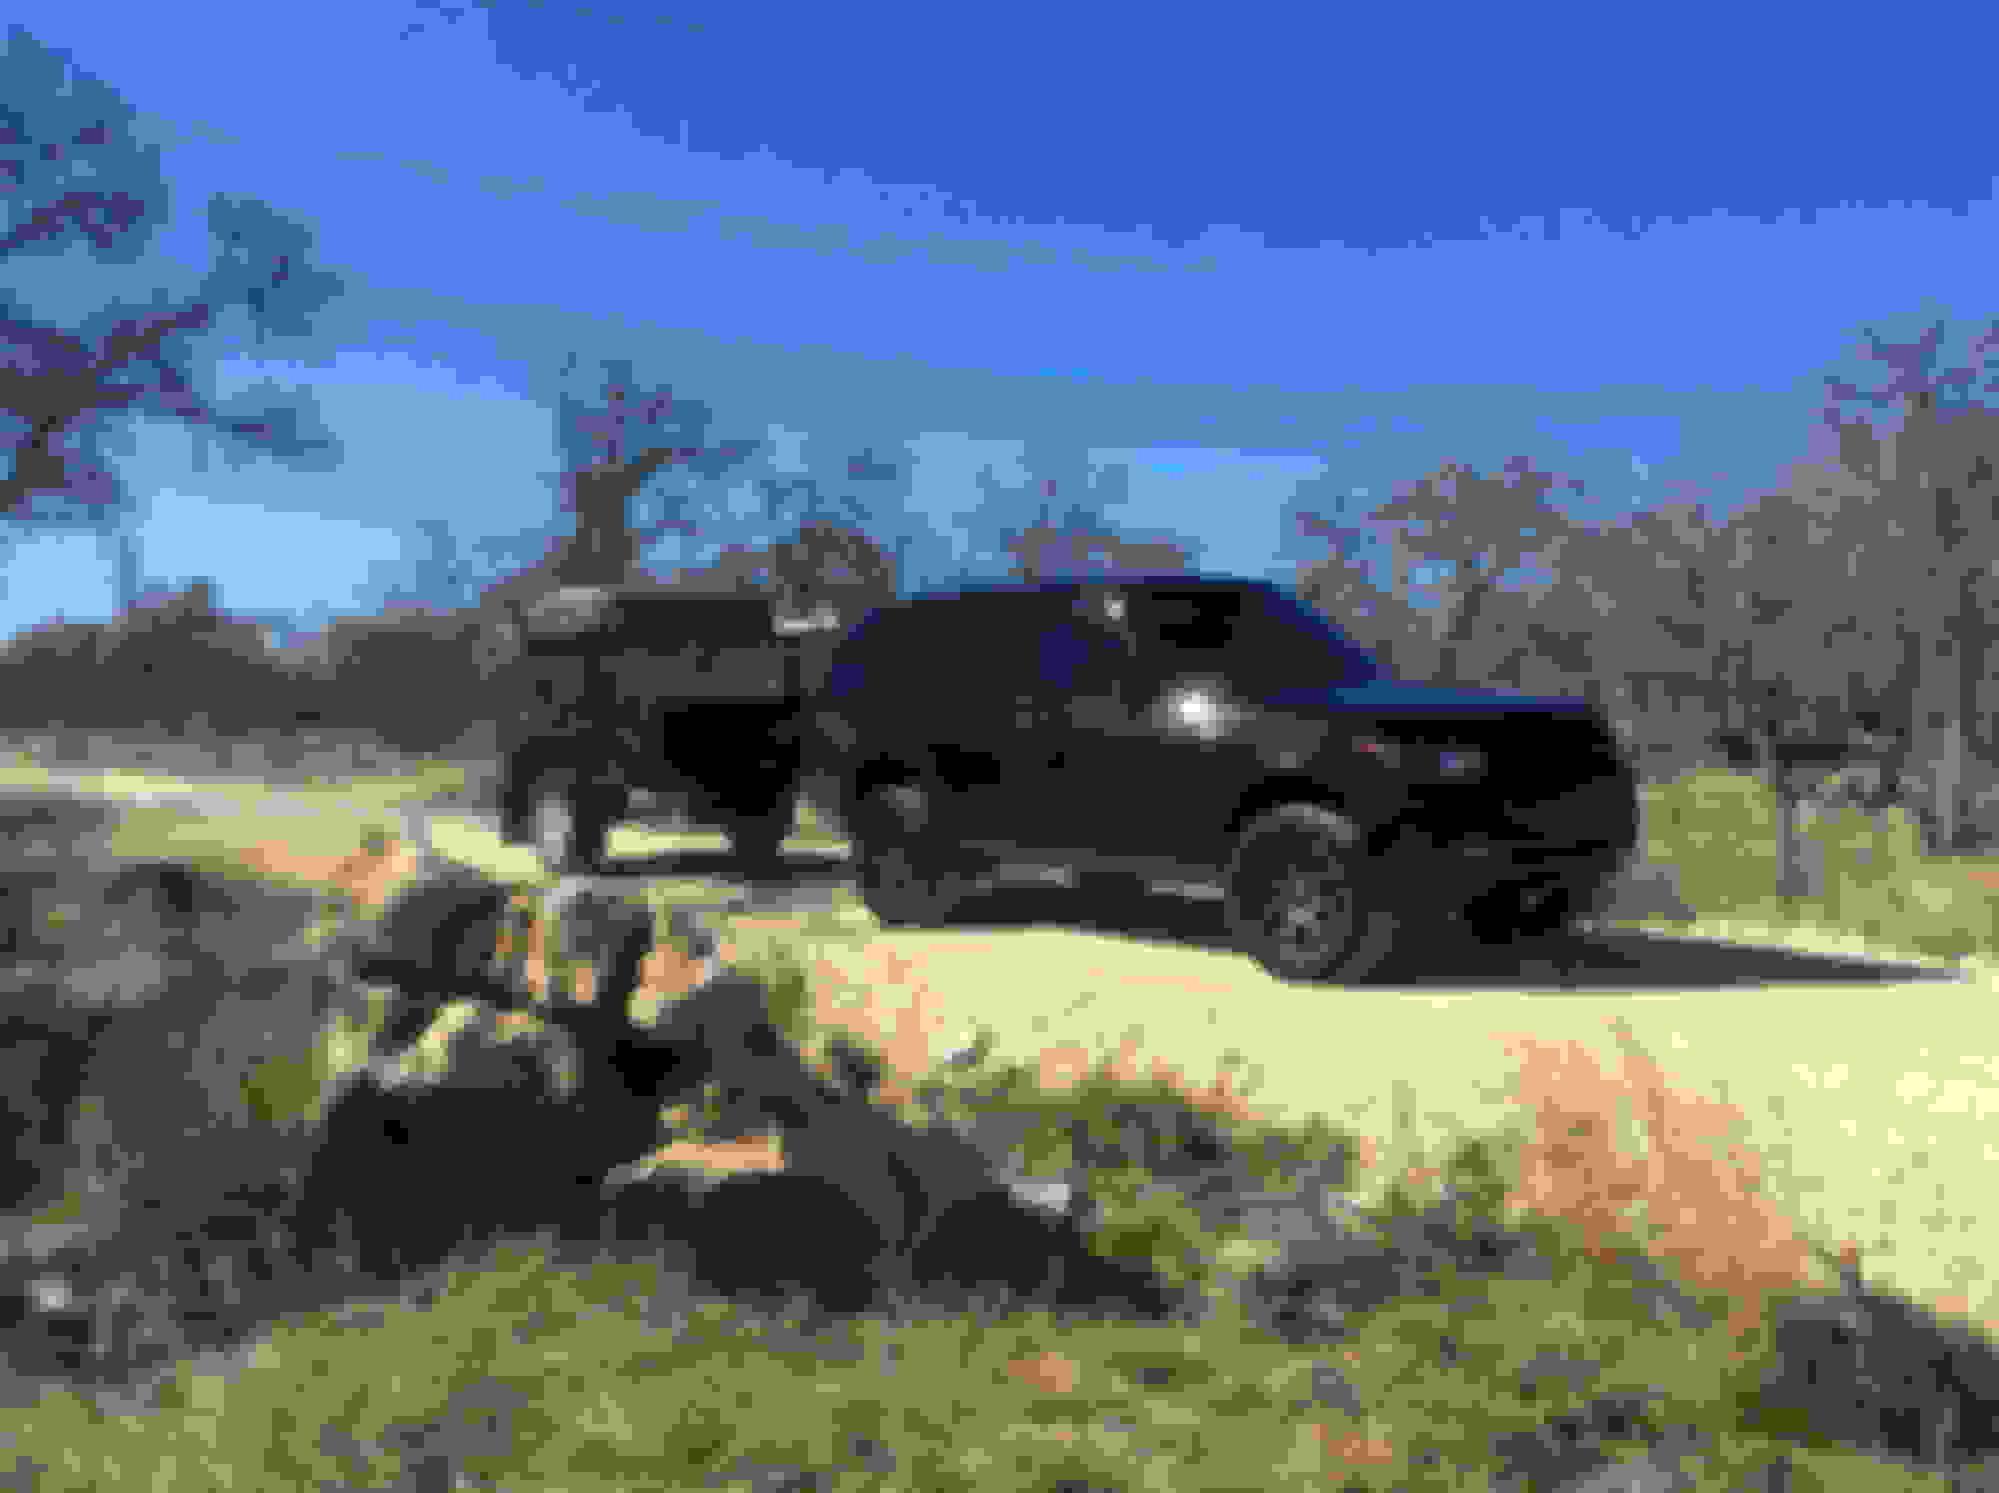 2016 L405 Range Rover - Land Rover Forums - Land Rover